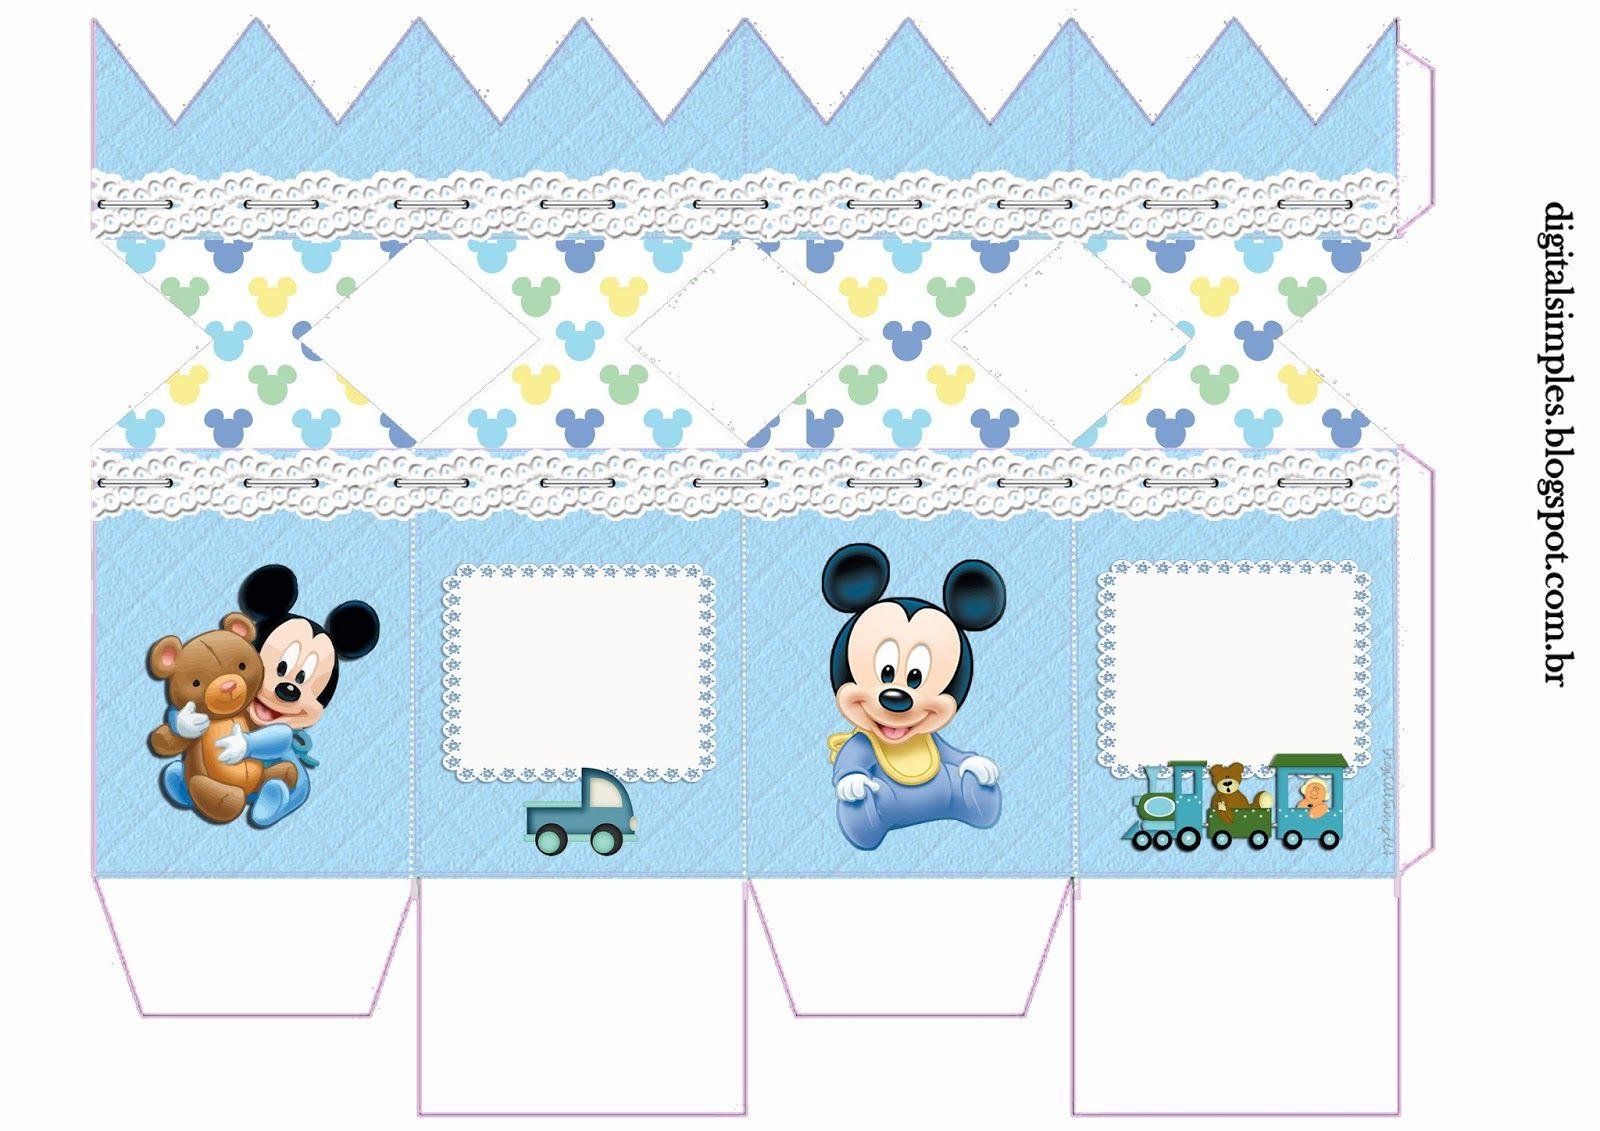 Kit Personalizados Mickey Mouse Baby Disney Para Imprimir Com